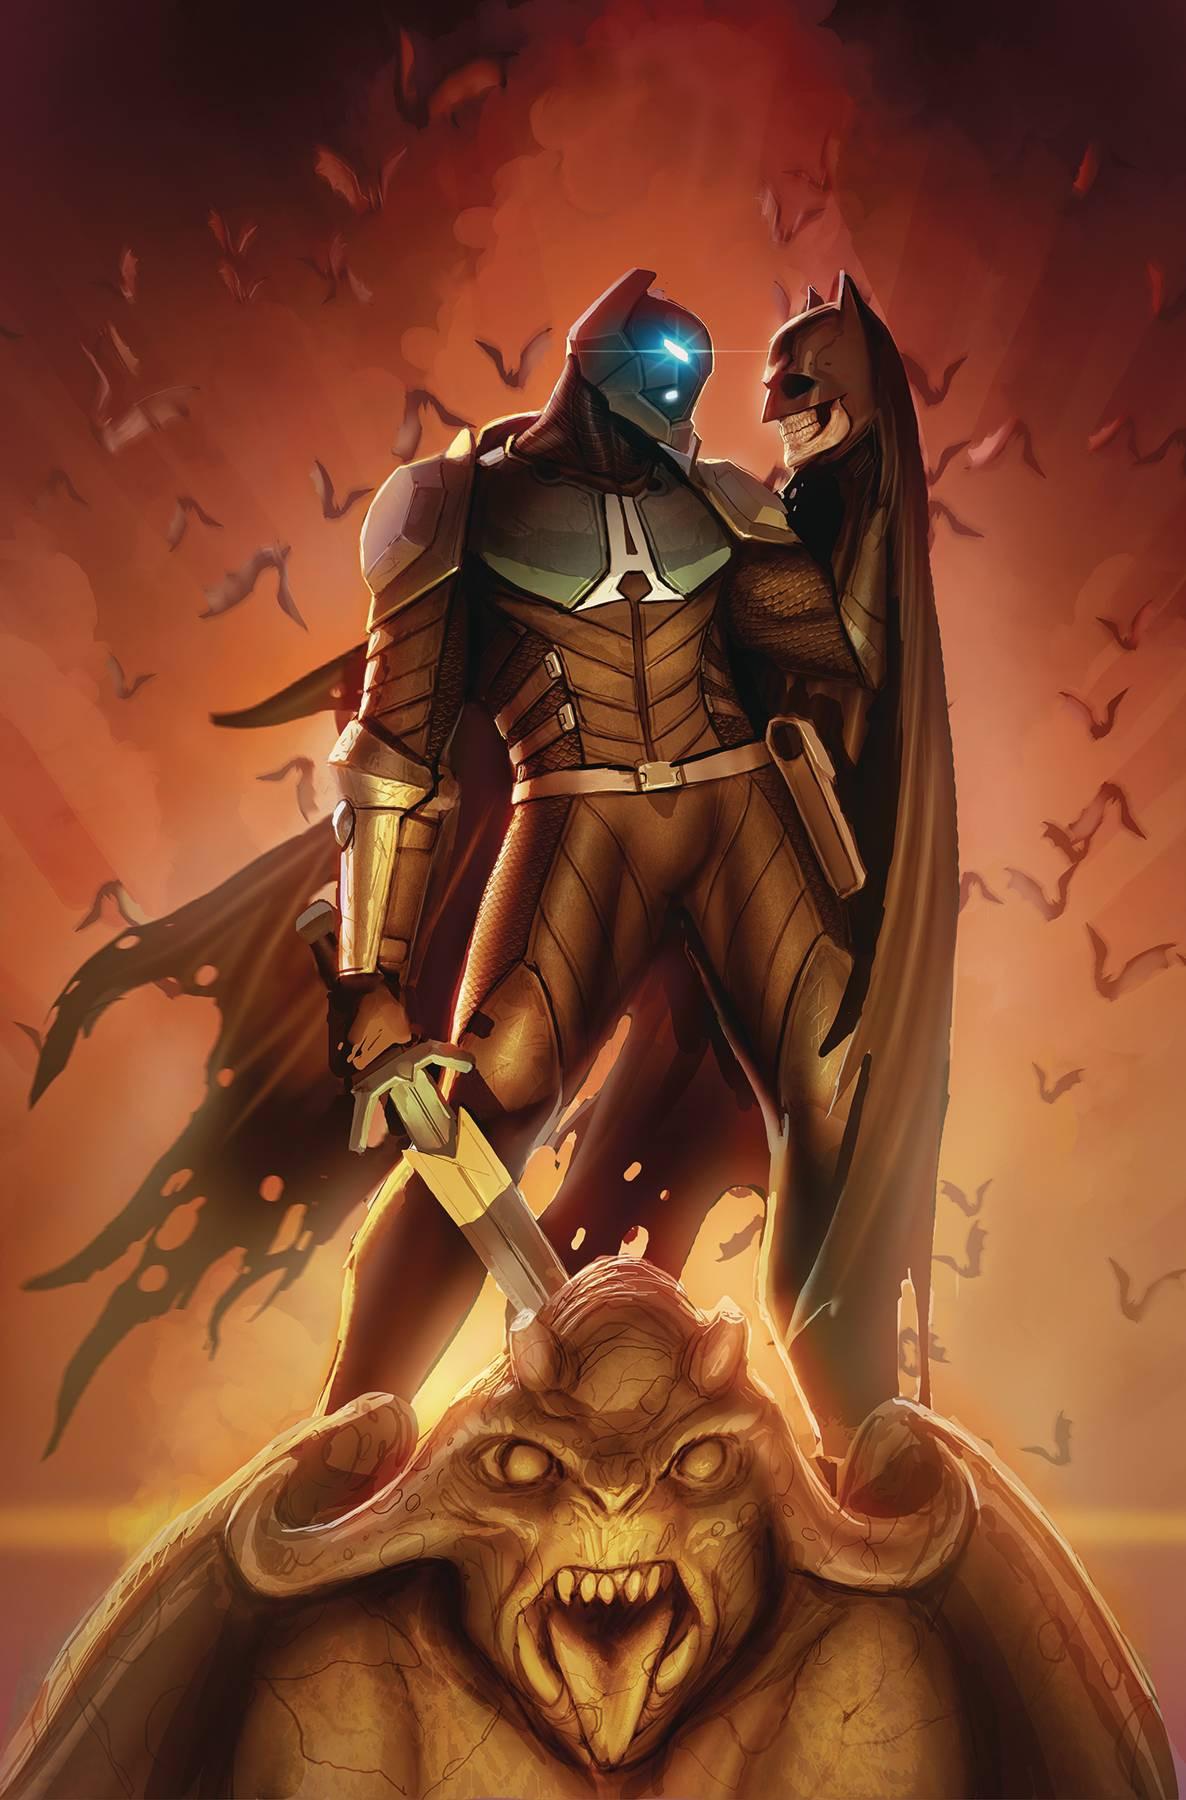 Hell knight ingrid episode 4